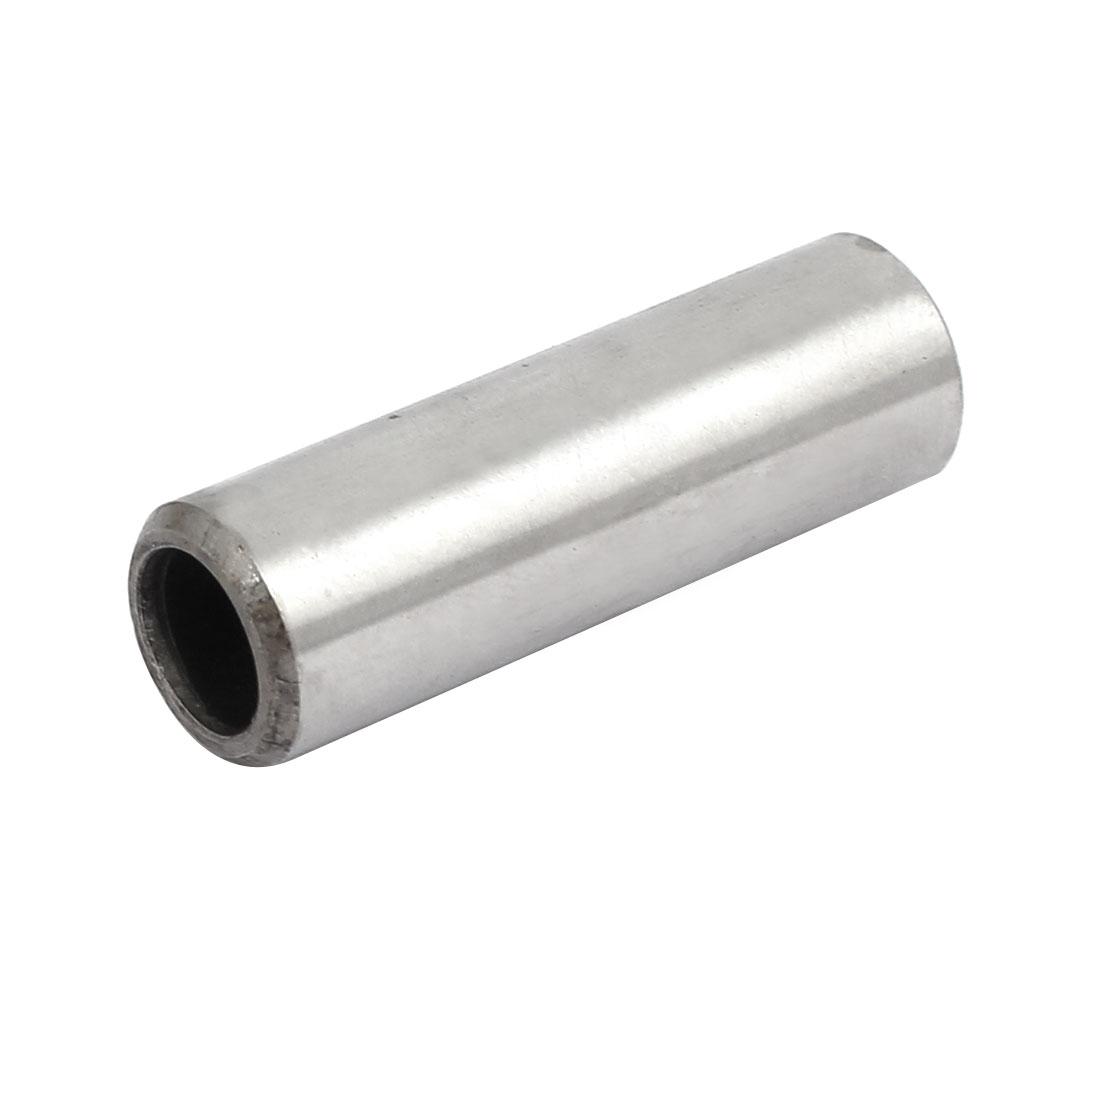 12mm OD 38mm Height Iron Piston Gudgeon Pin Air Compressor Accessory